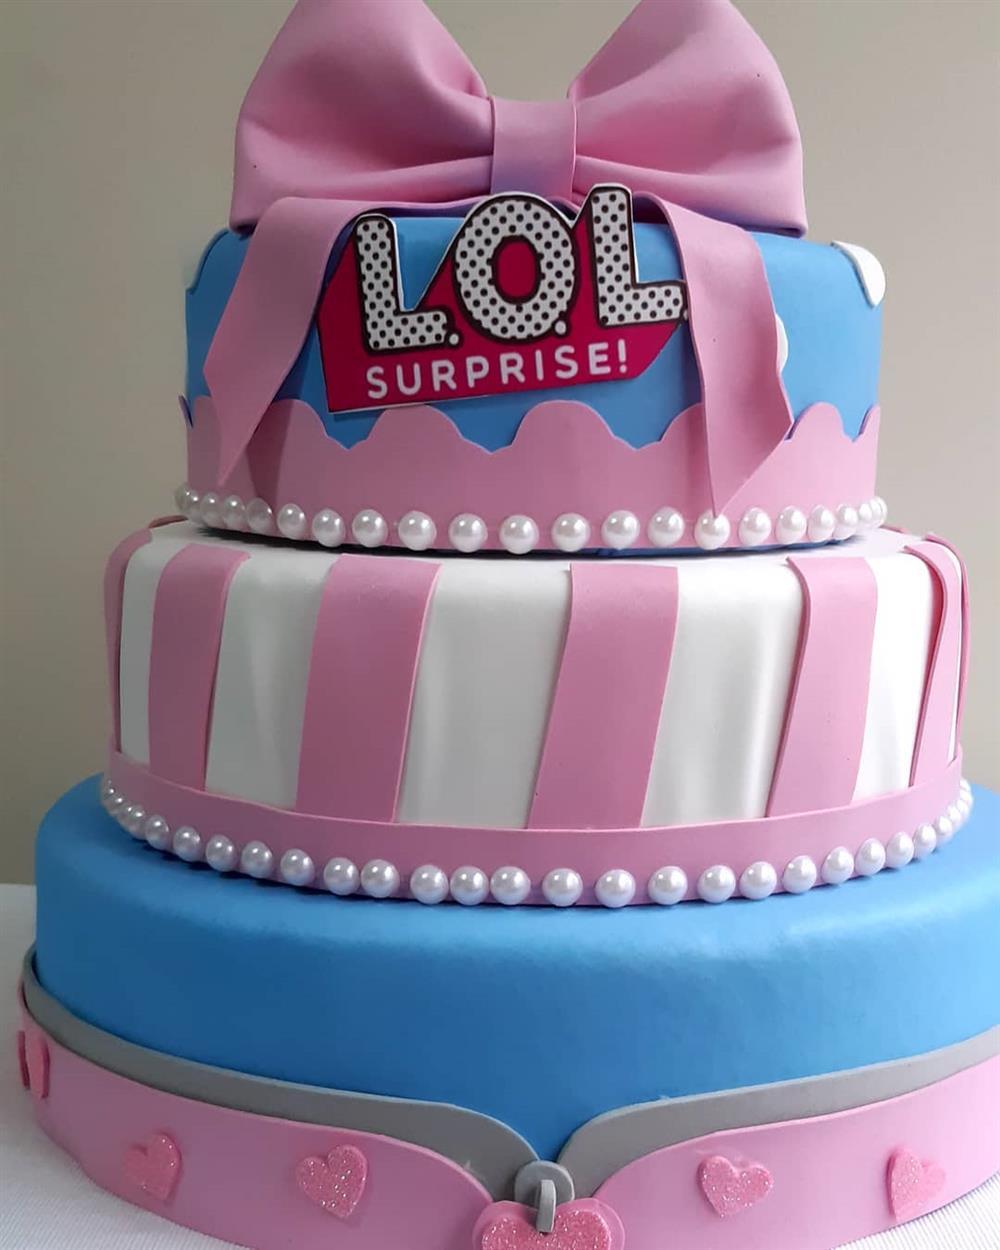 falso lol cake con arco